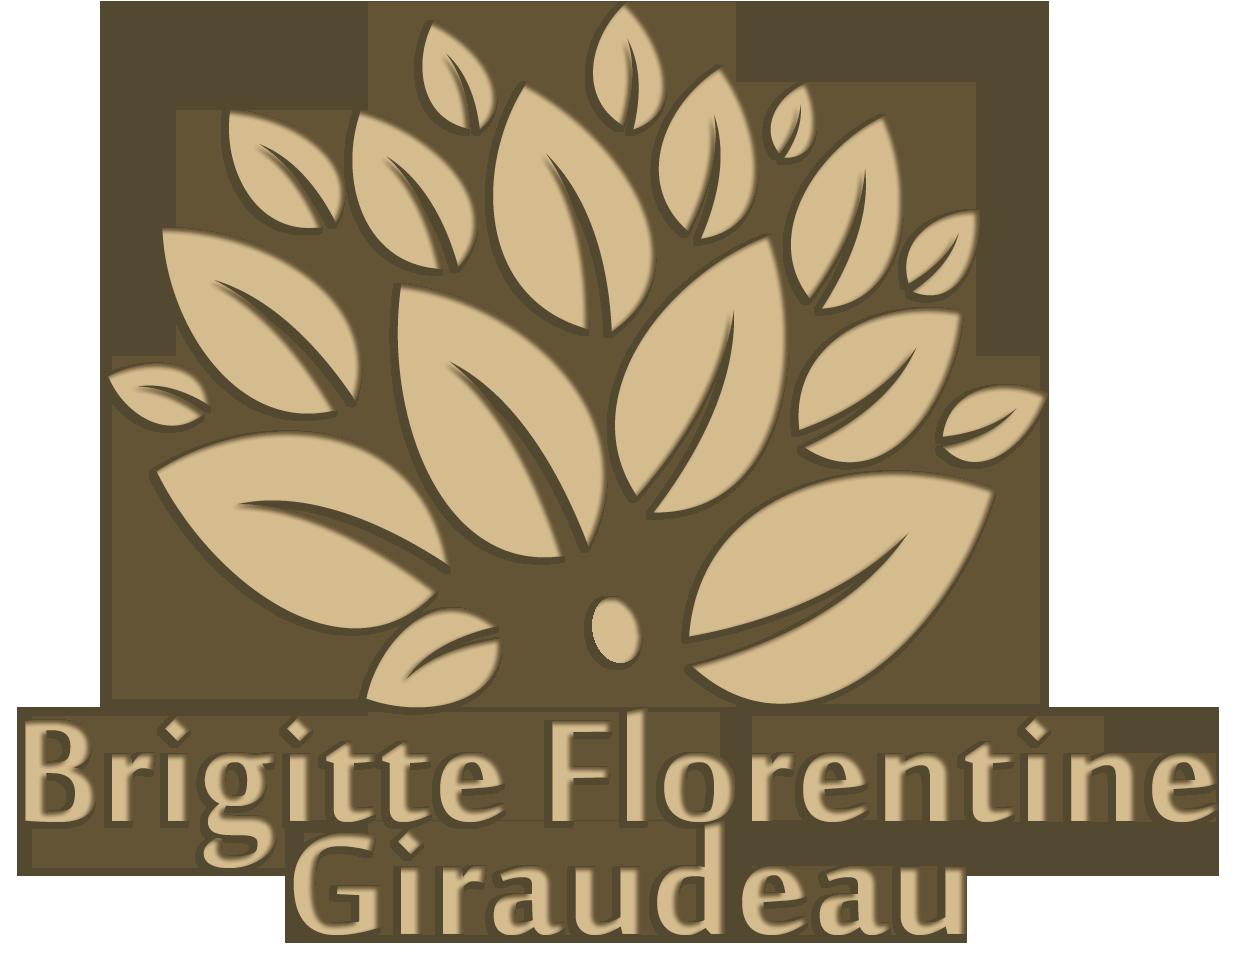 Naturopathe à Paris 12 - Brigitte Florentine GIRAUDEAU